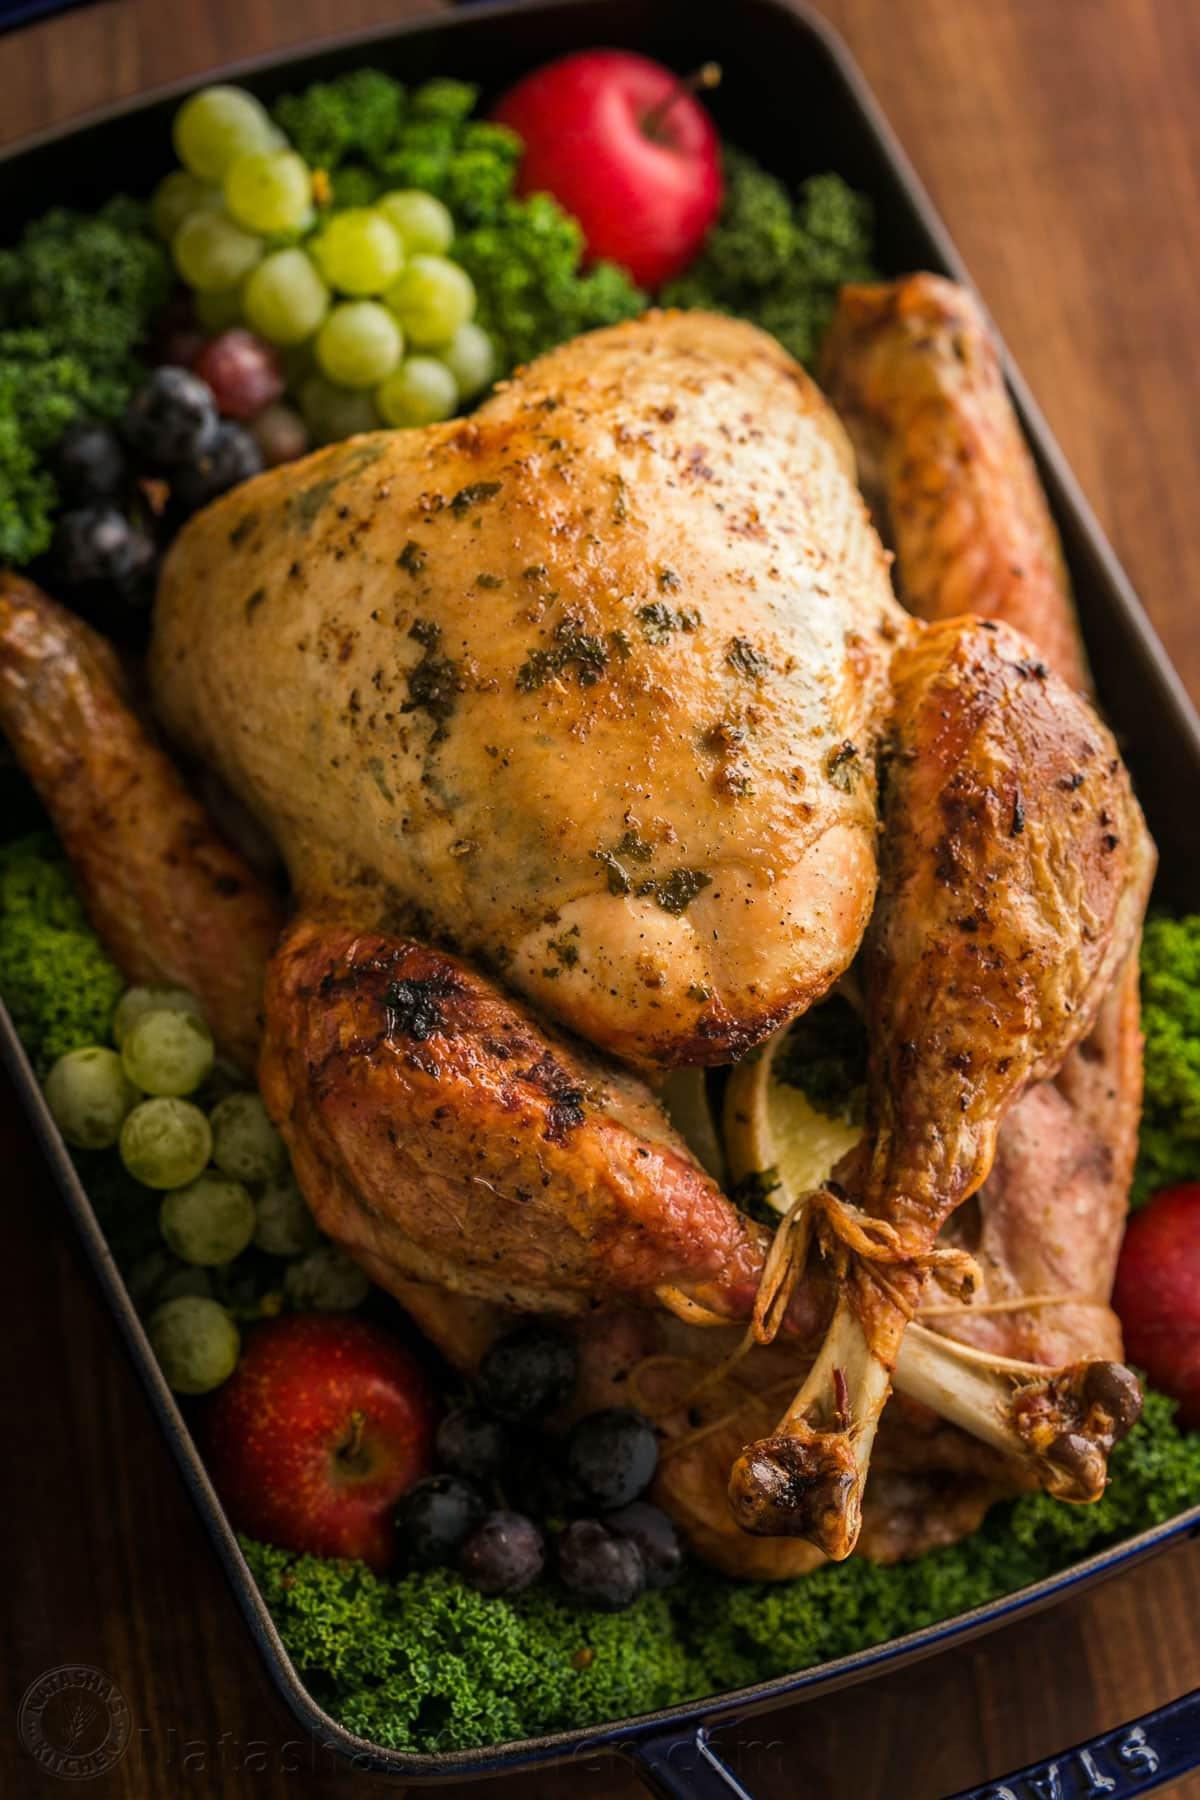 Turkey On Thanksgiving  Thanksgiving Turkey Recipe VIDEO NatashasKitchen